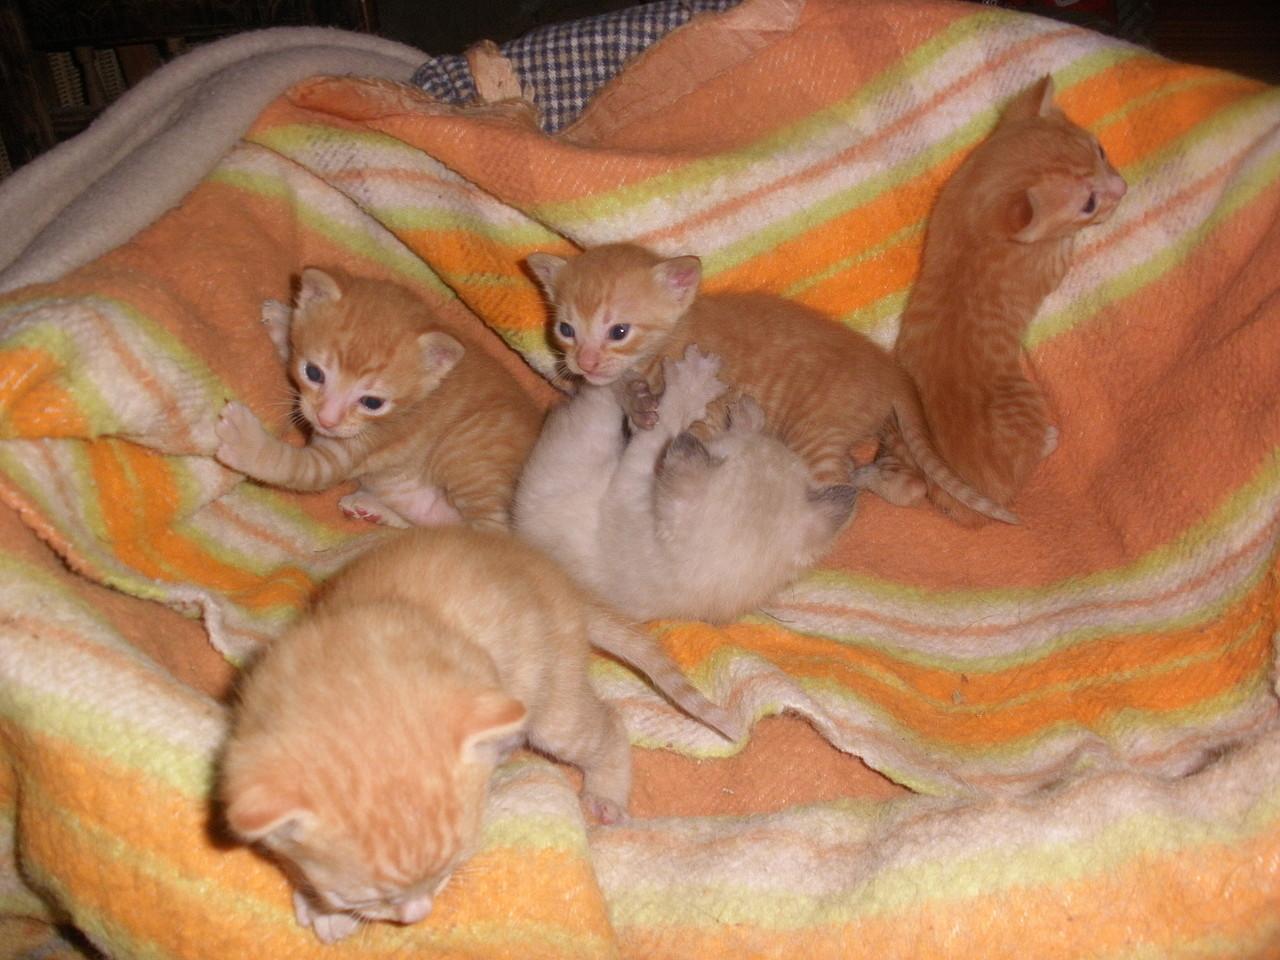 Gatitos Comun Europeo, 4 machos y 1 hembra, 29 dias. Criados con perros. Guipuzcoa 3B502962FE204FAD32092F4FAD2E4C